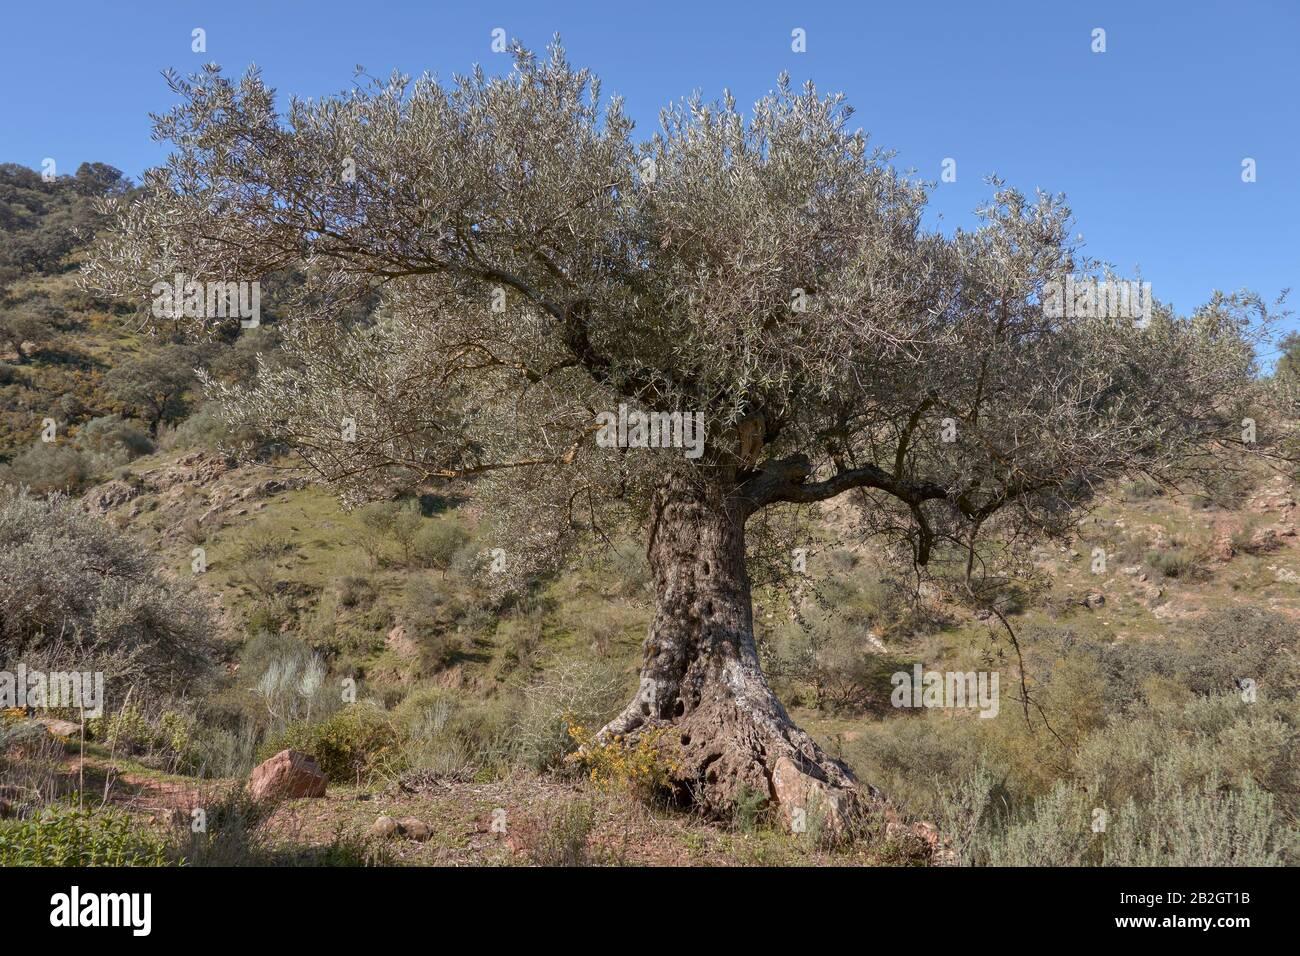 Centennial olive tree in Casabermeja, Malaga. Spain Stock Photo